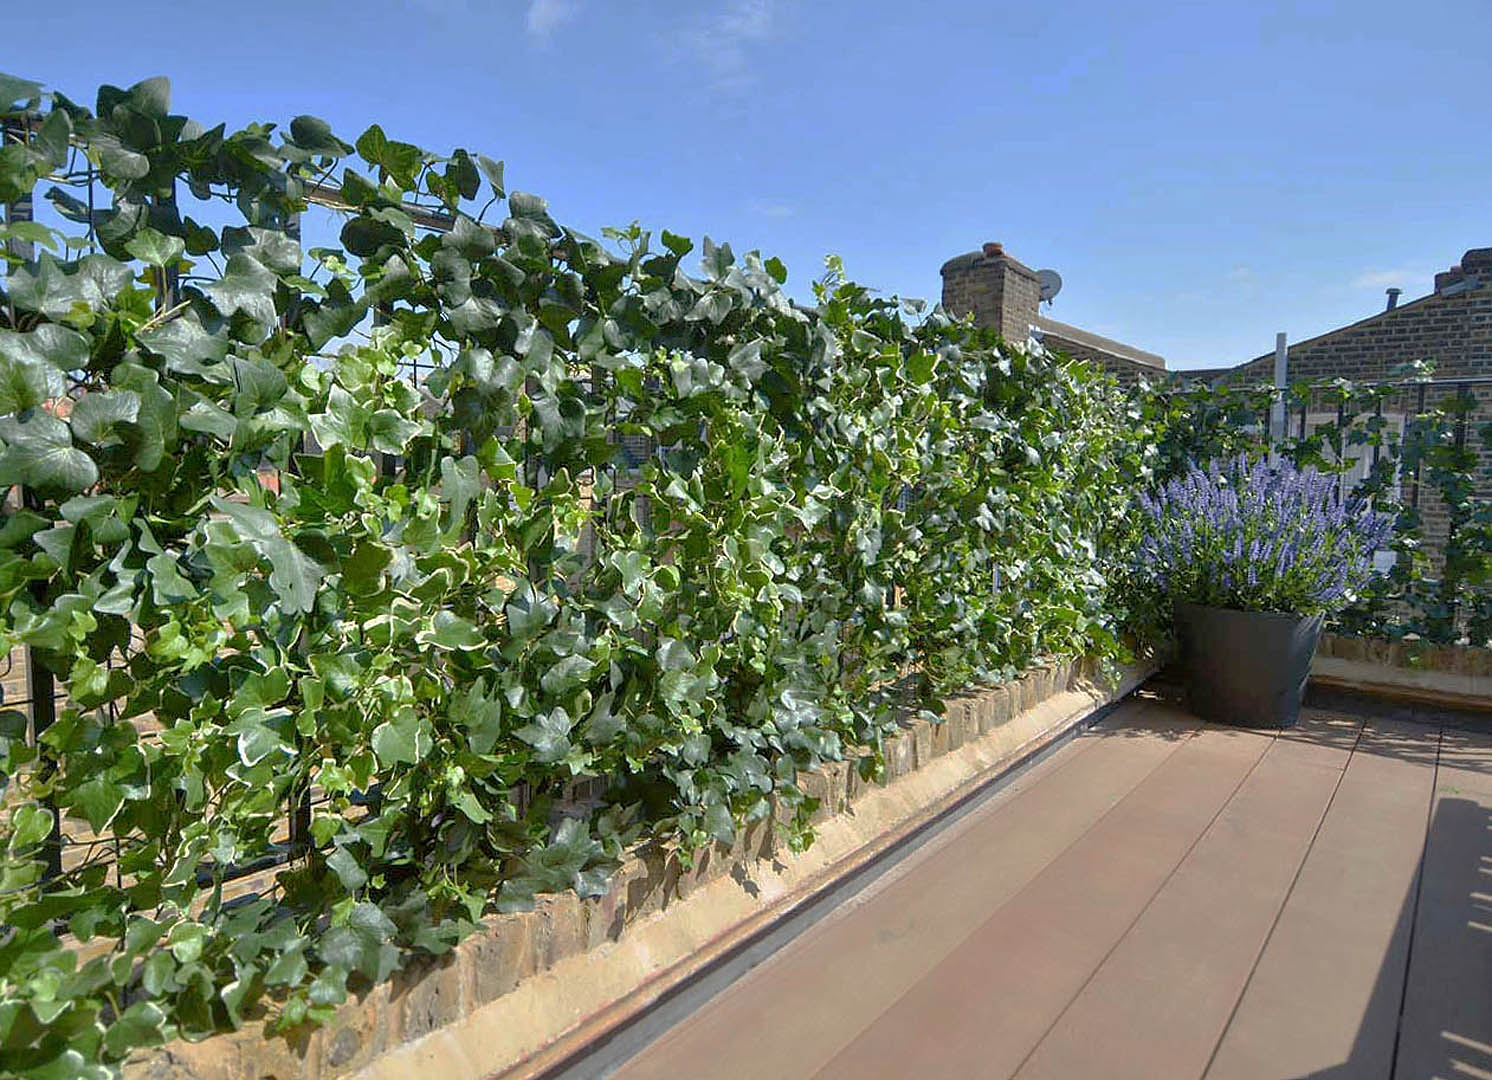 437 Fake Landscapes UV ivy terrace open screening